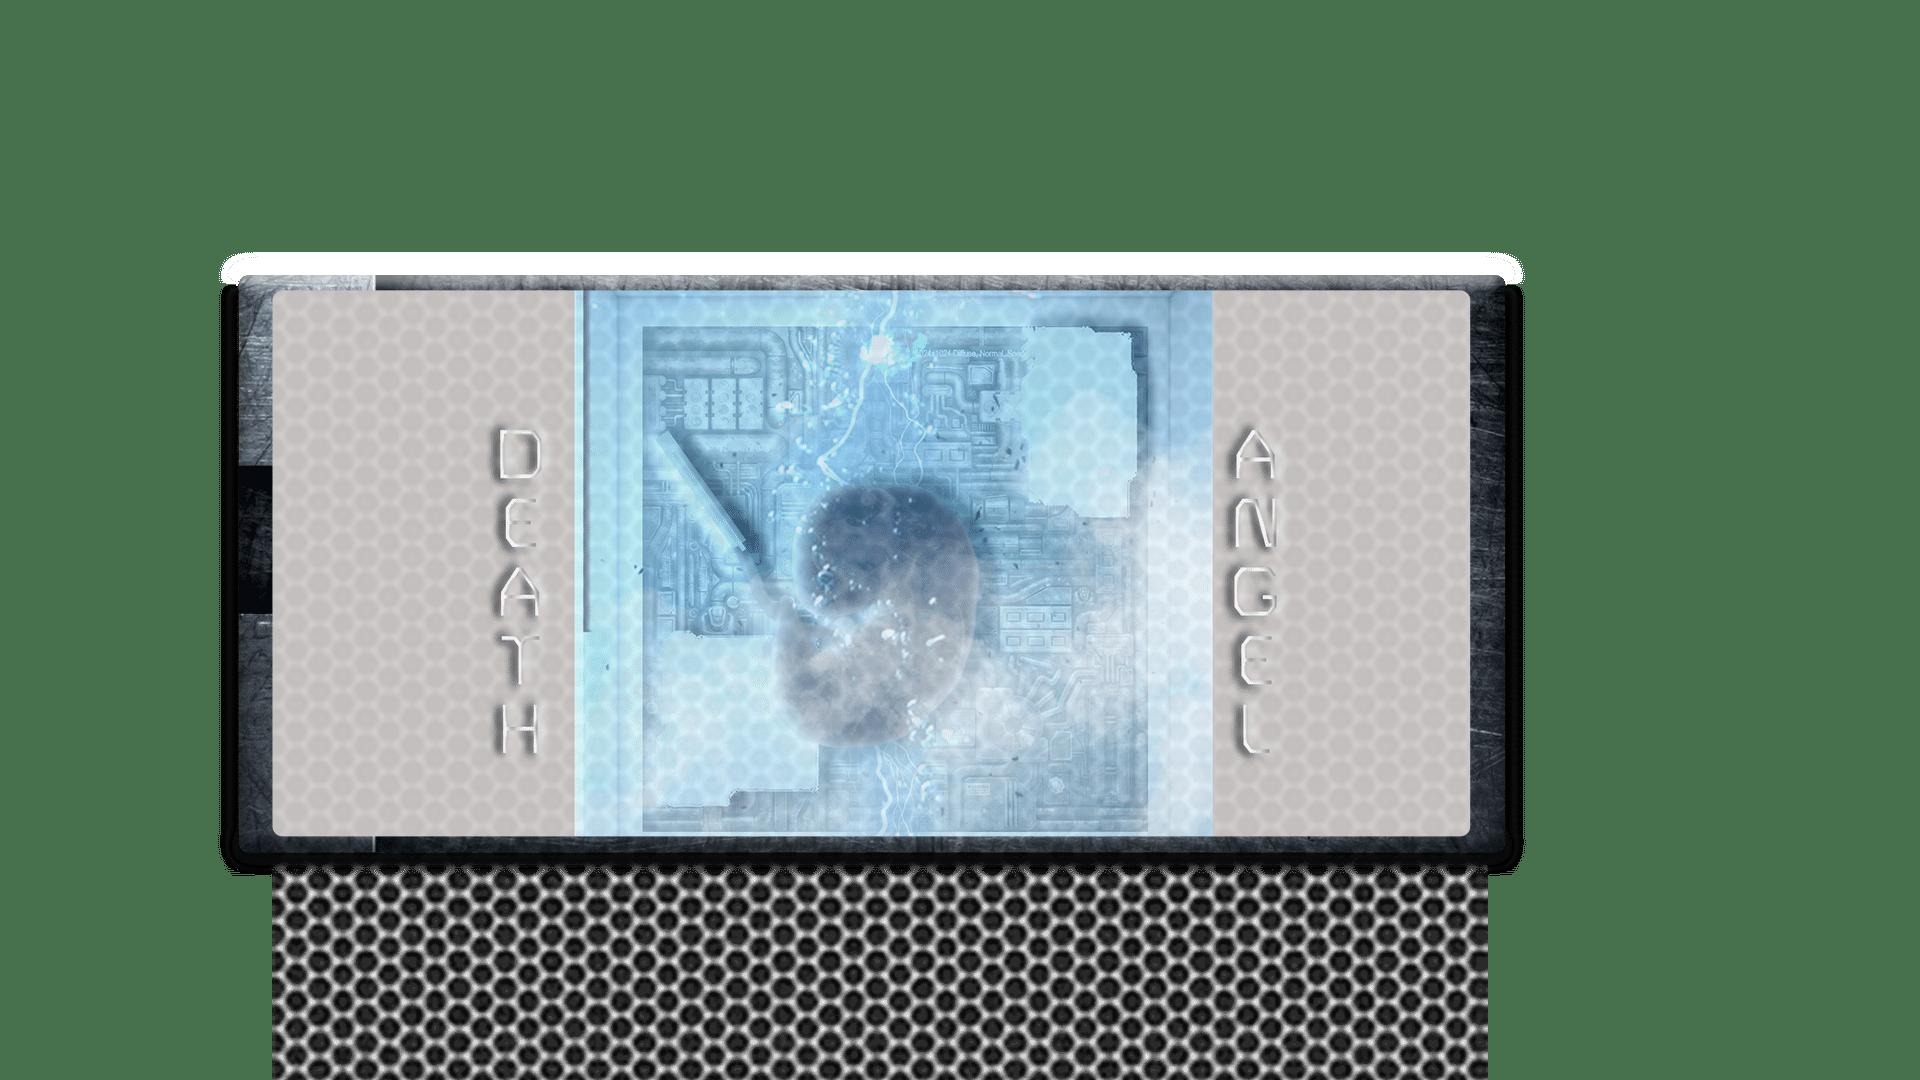 3211 Chip Background